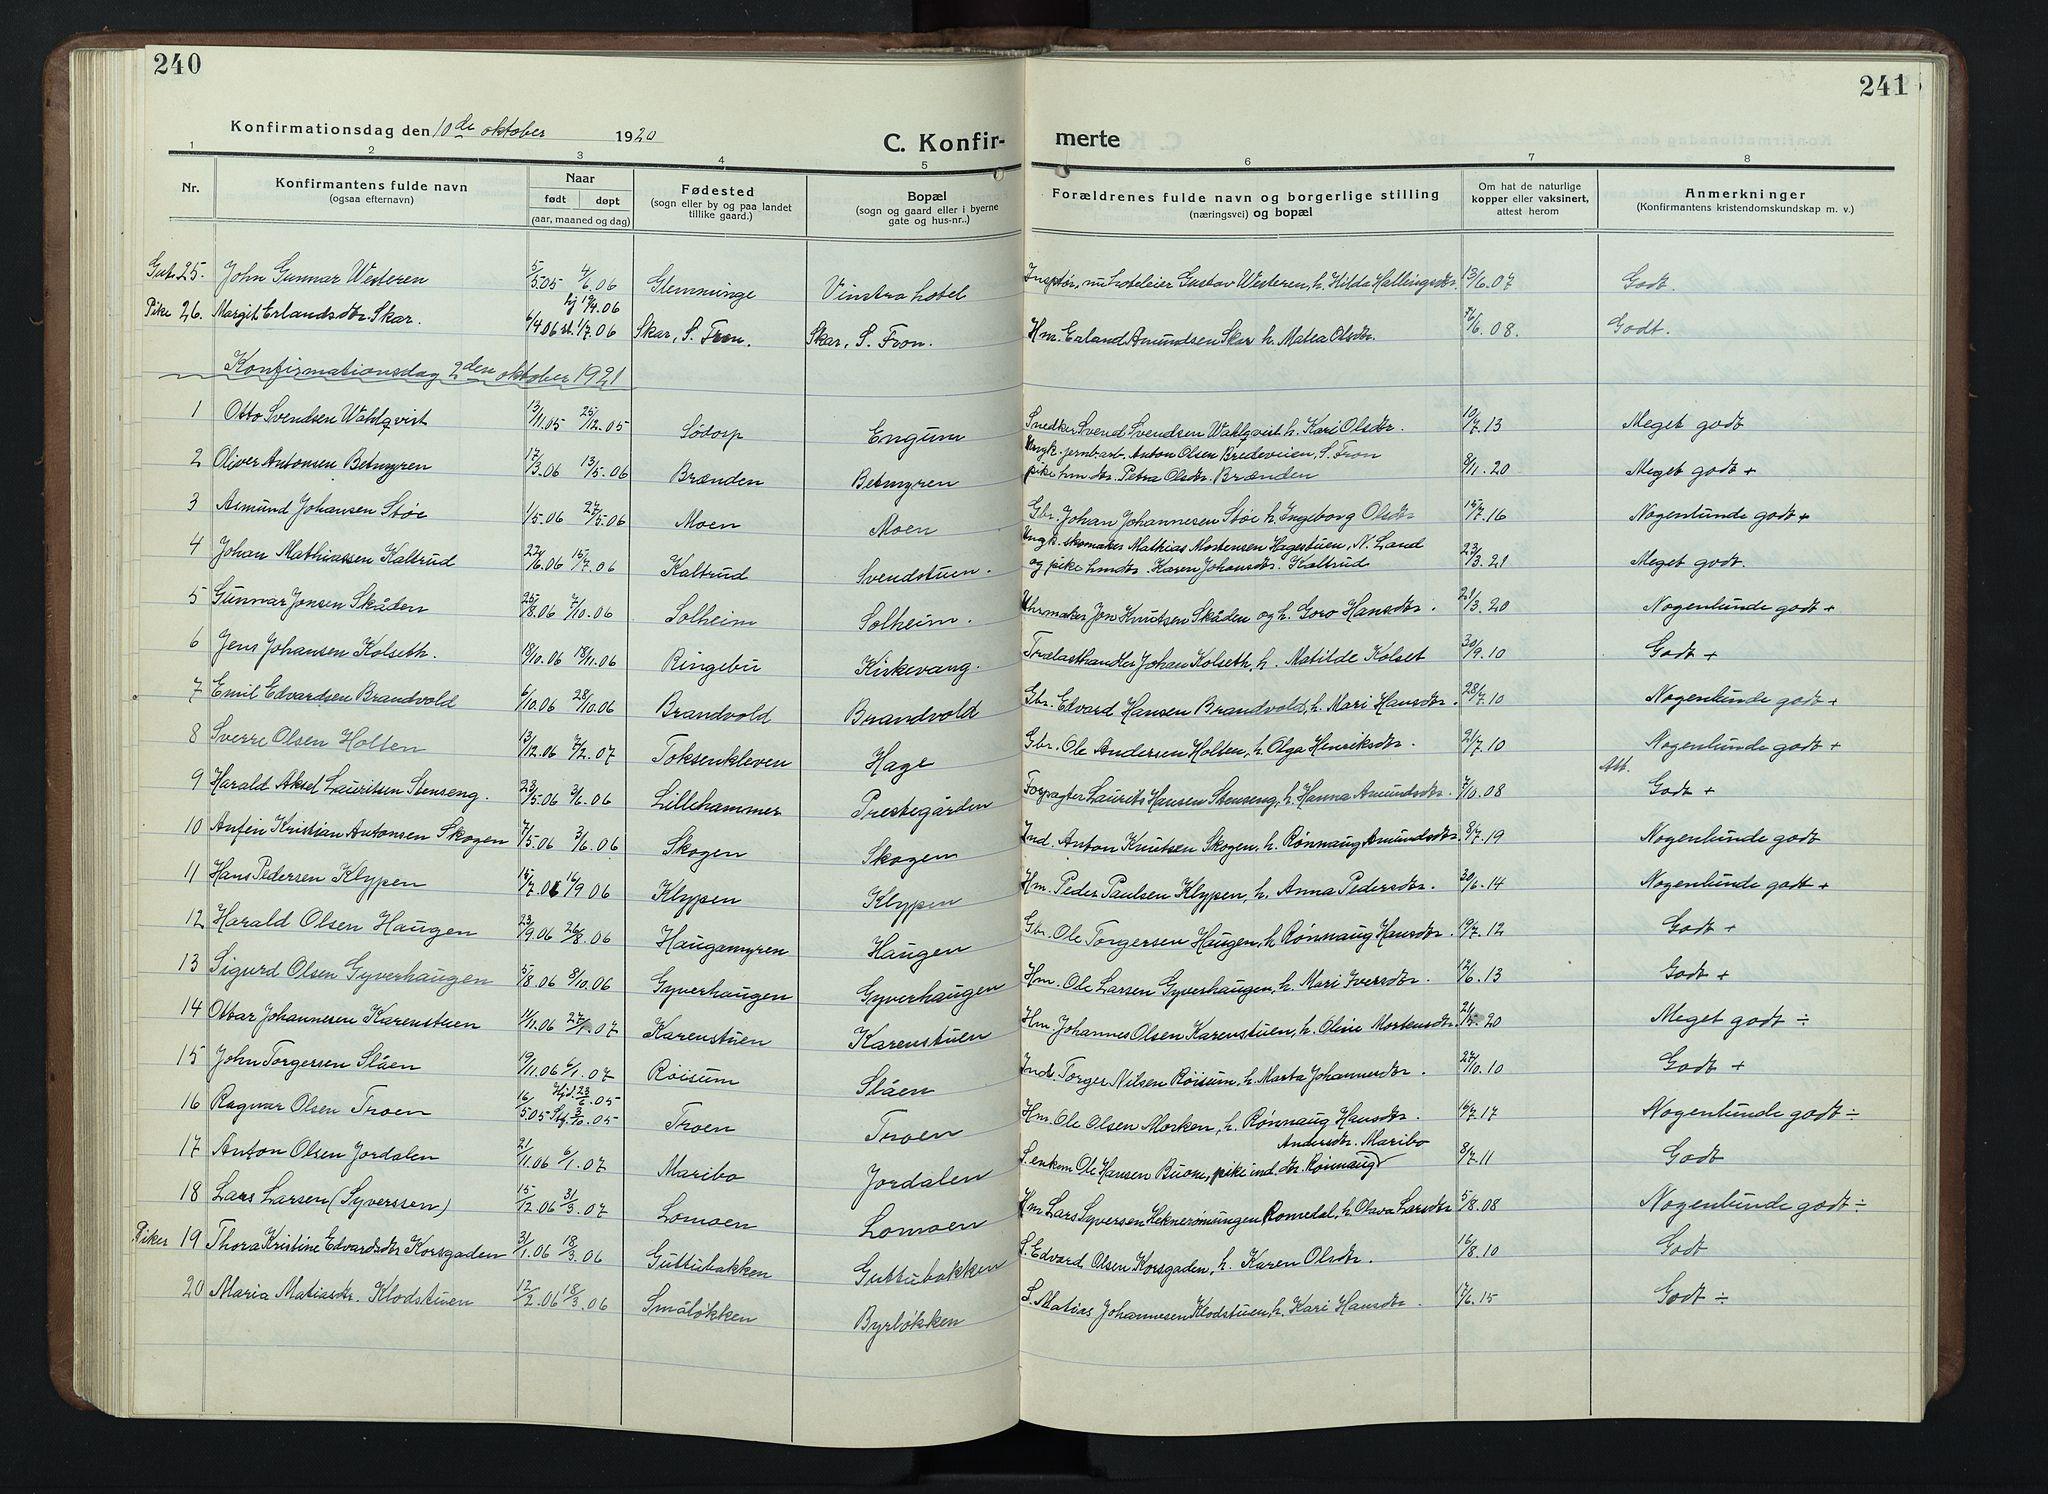 SAH, Nord-Fron prestekontor, Klokkerbok nr. 7, 1915-1946, s. 240-241